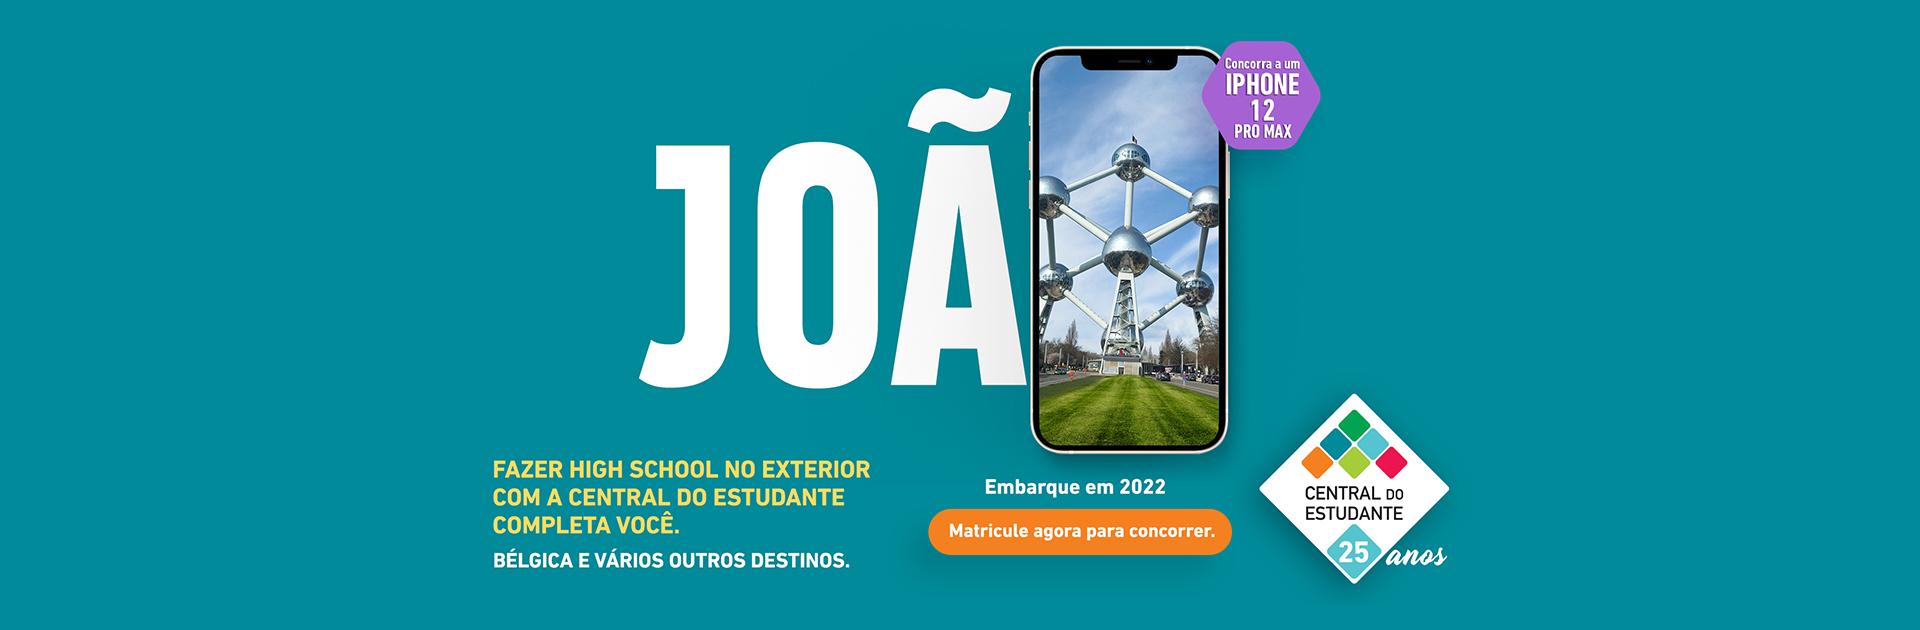 10185_central_estudantes_campanha2022_Alunos_joao